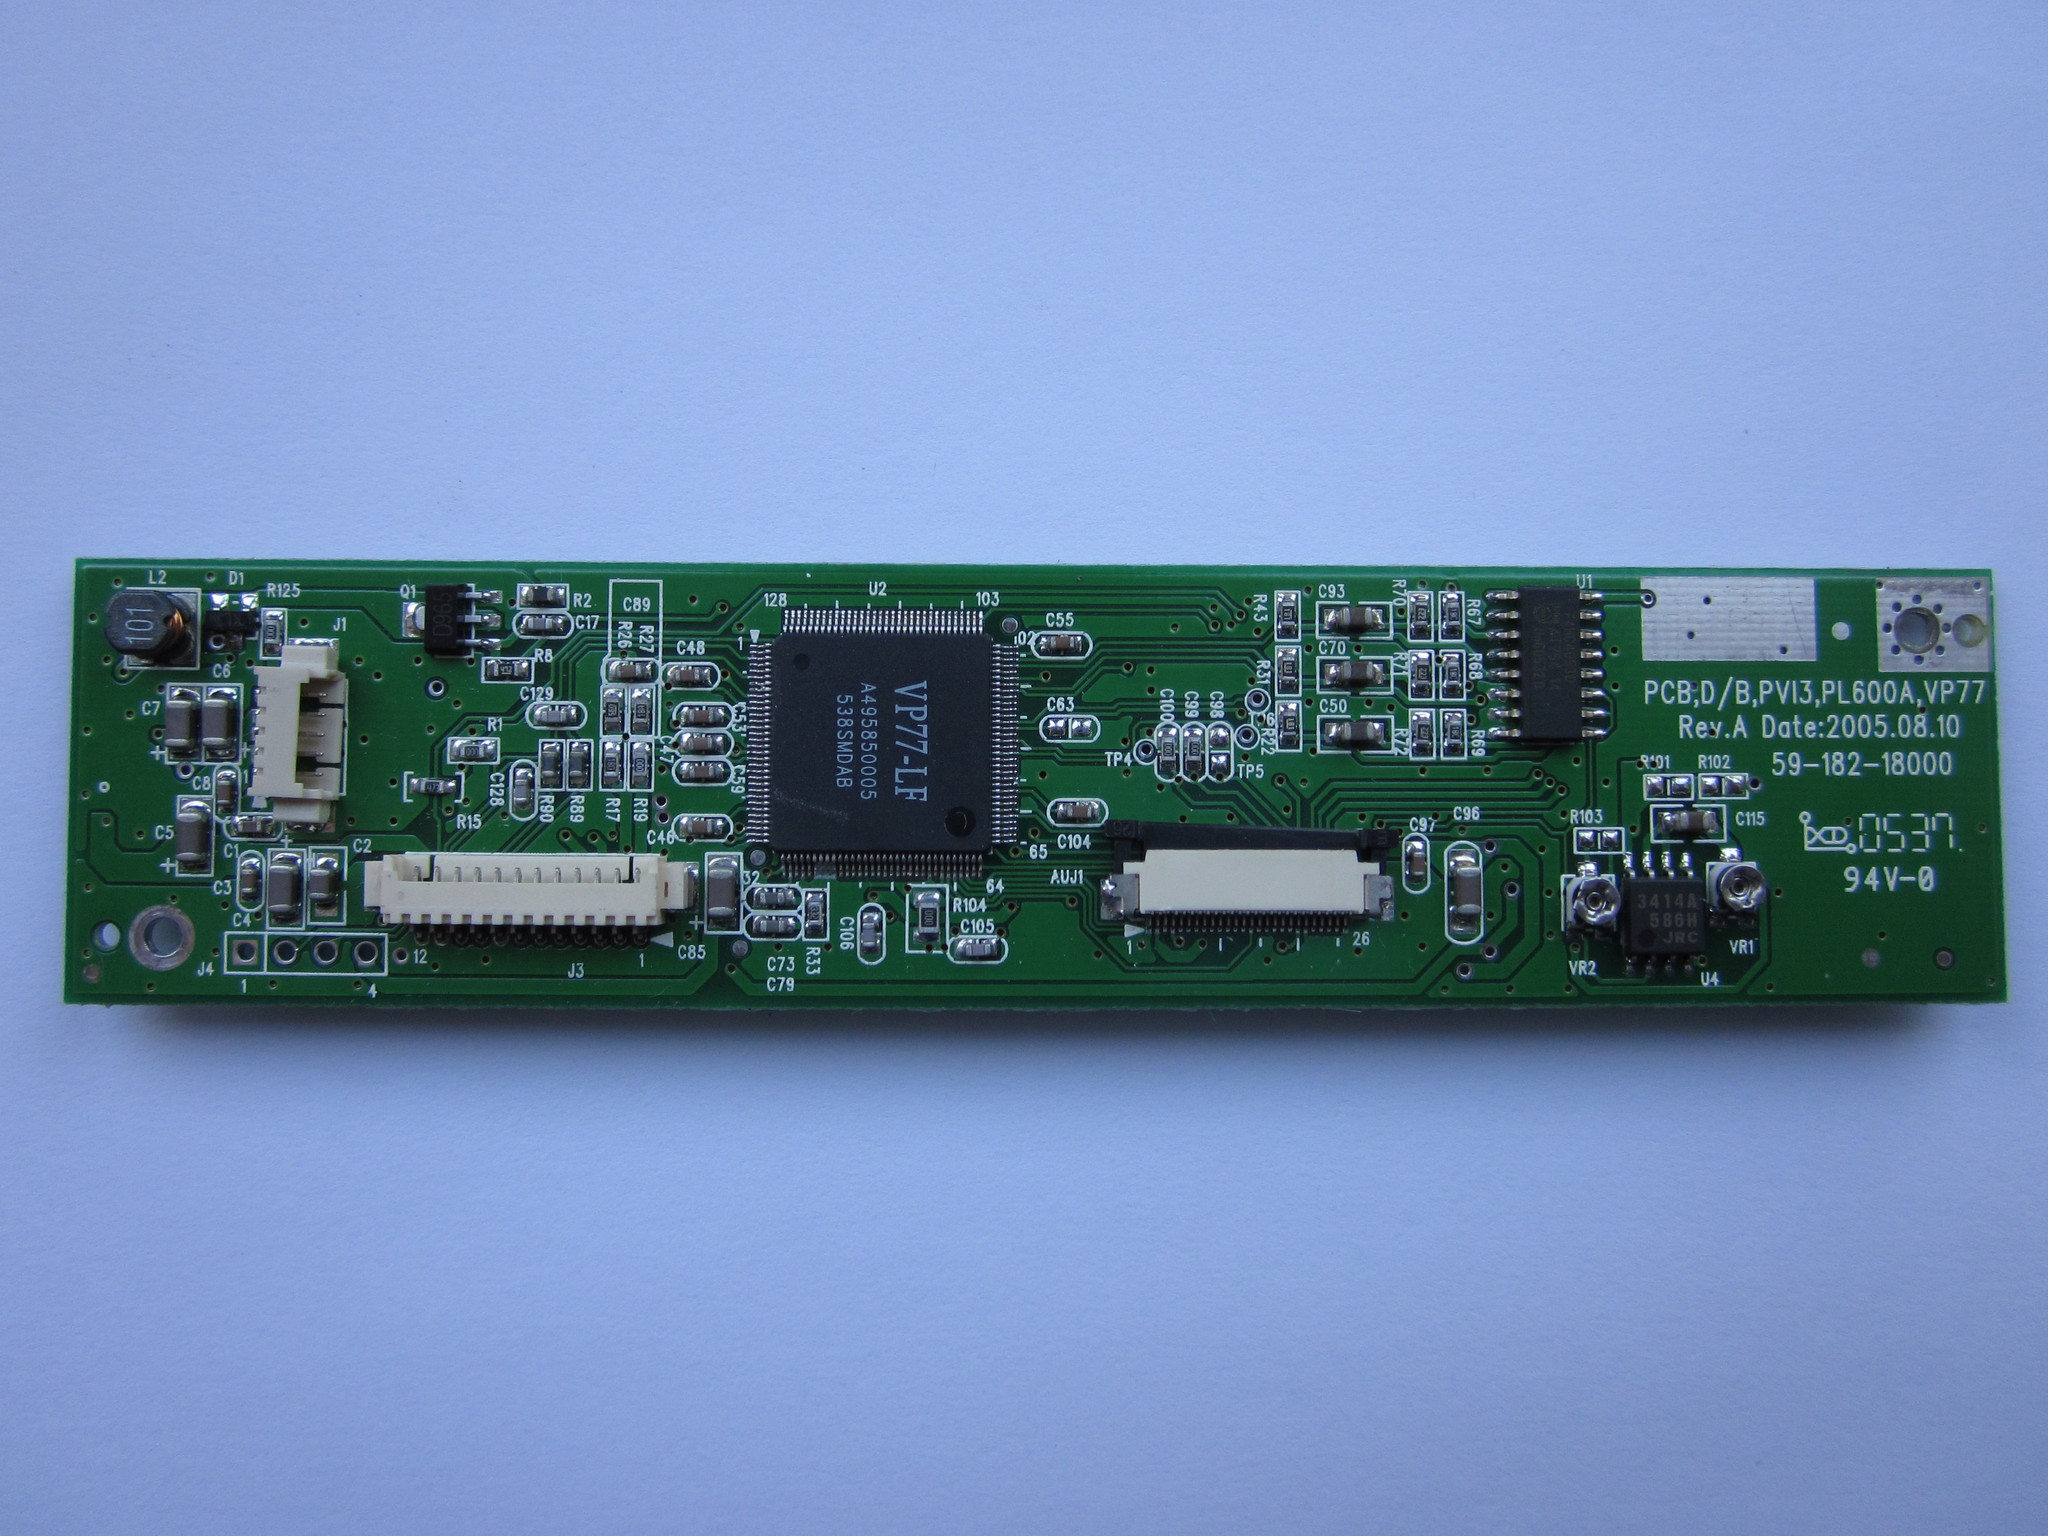 Плата PCB,D/B,PVI3,PL600A,VP77  Rev.A